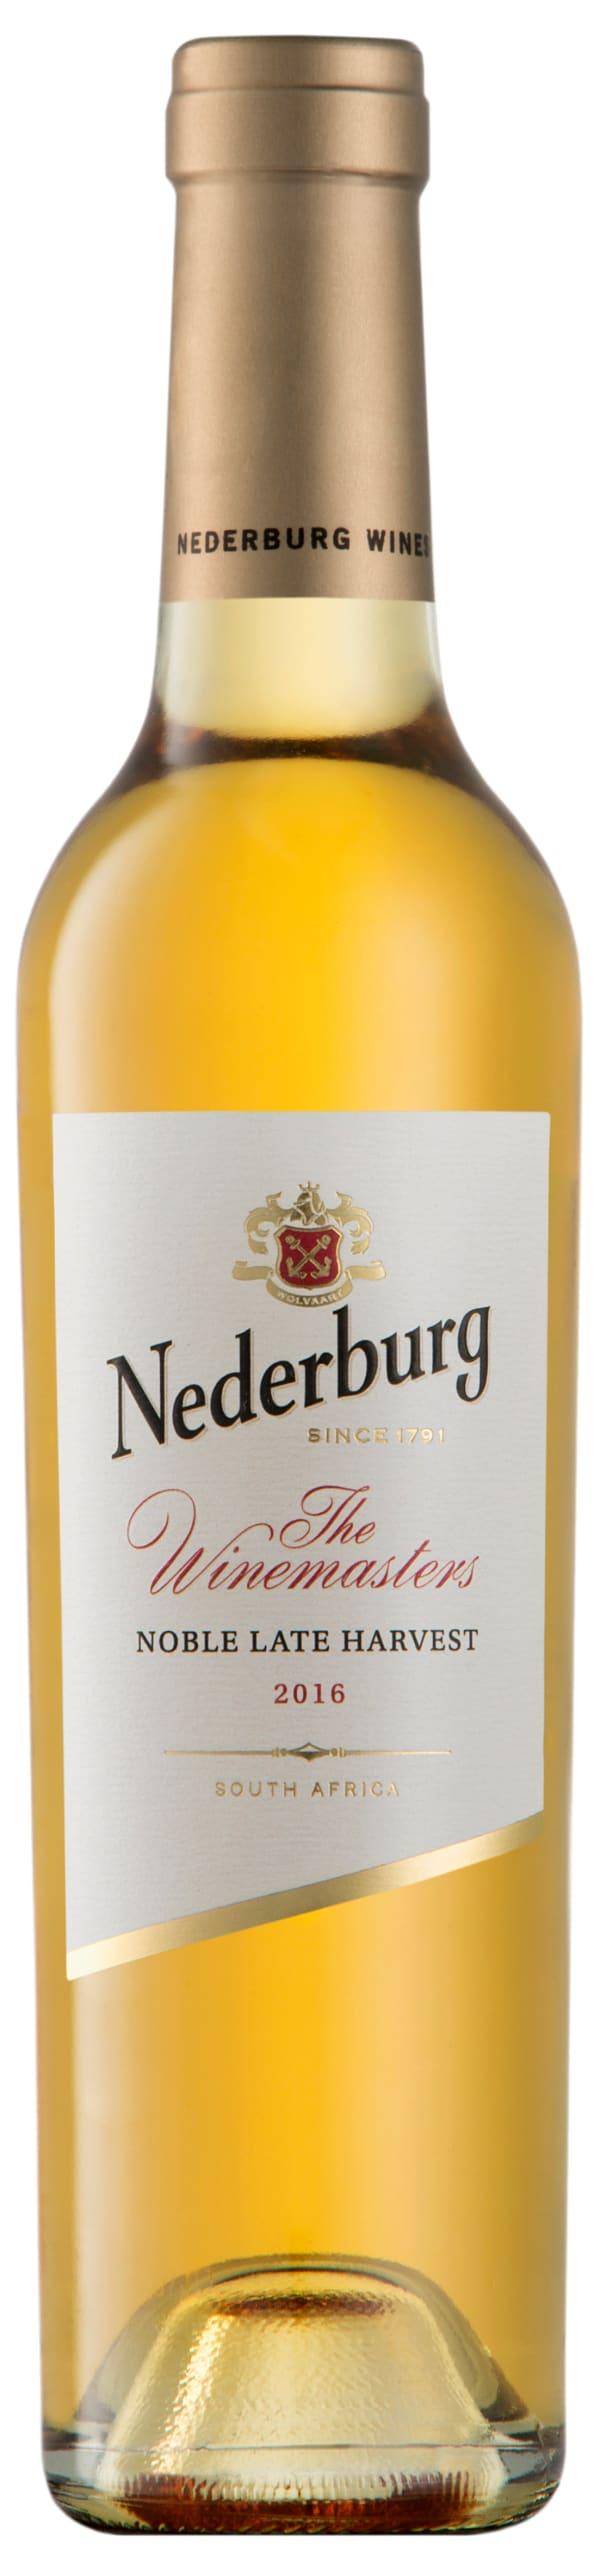 Nederburg The Winemasters Noble Late Harvest 2017